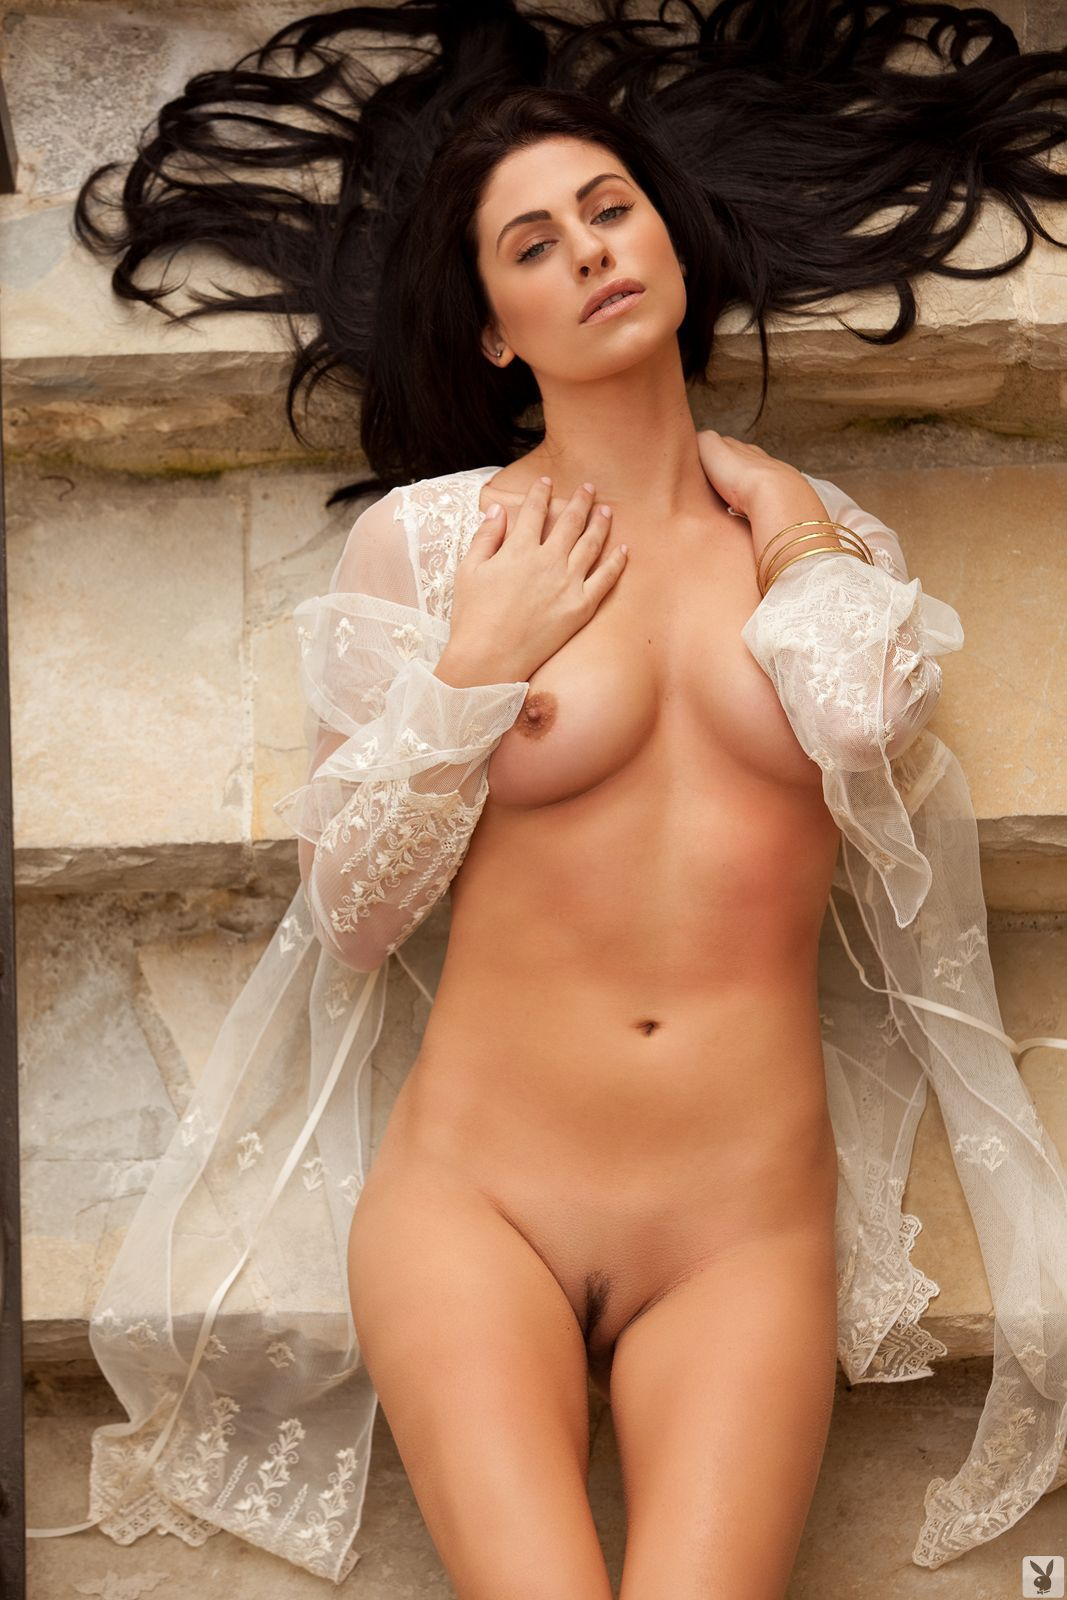 Eva marie nude pics